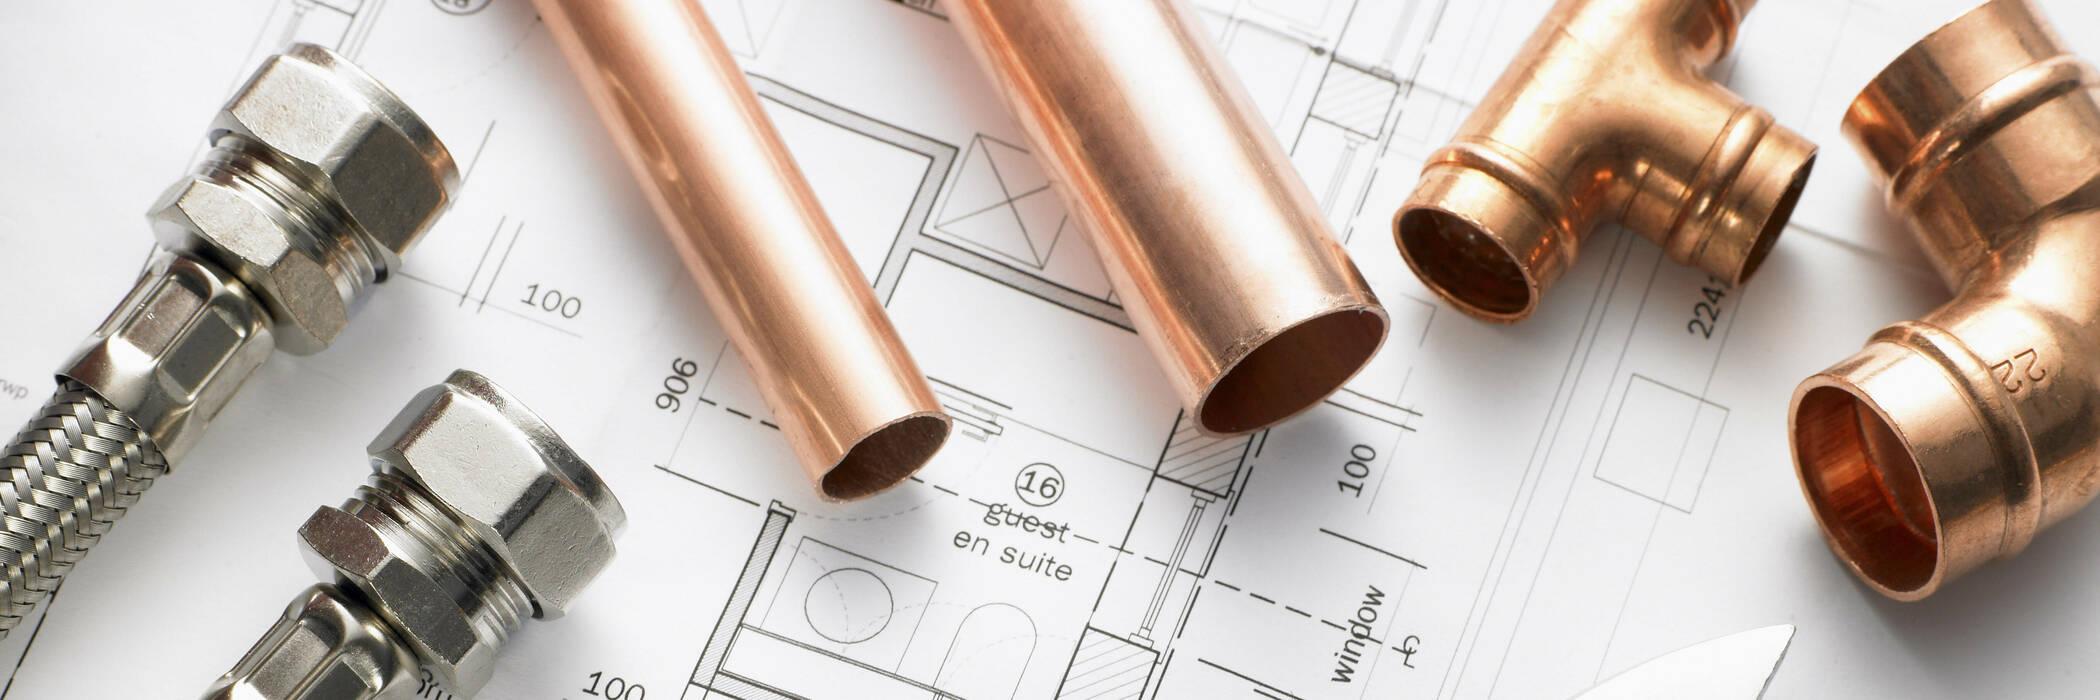 16apr plumbing products spur complaints hero